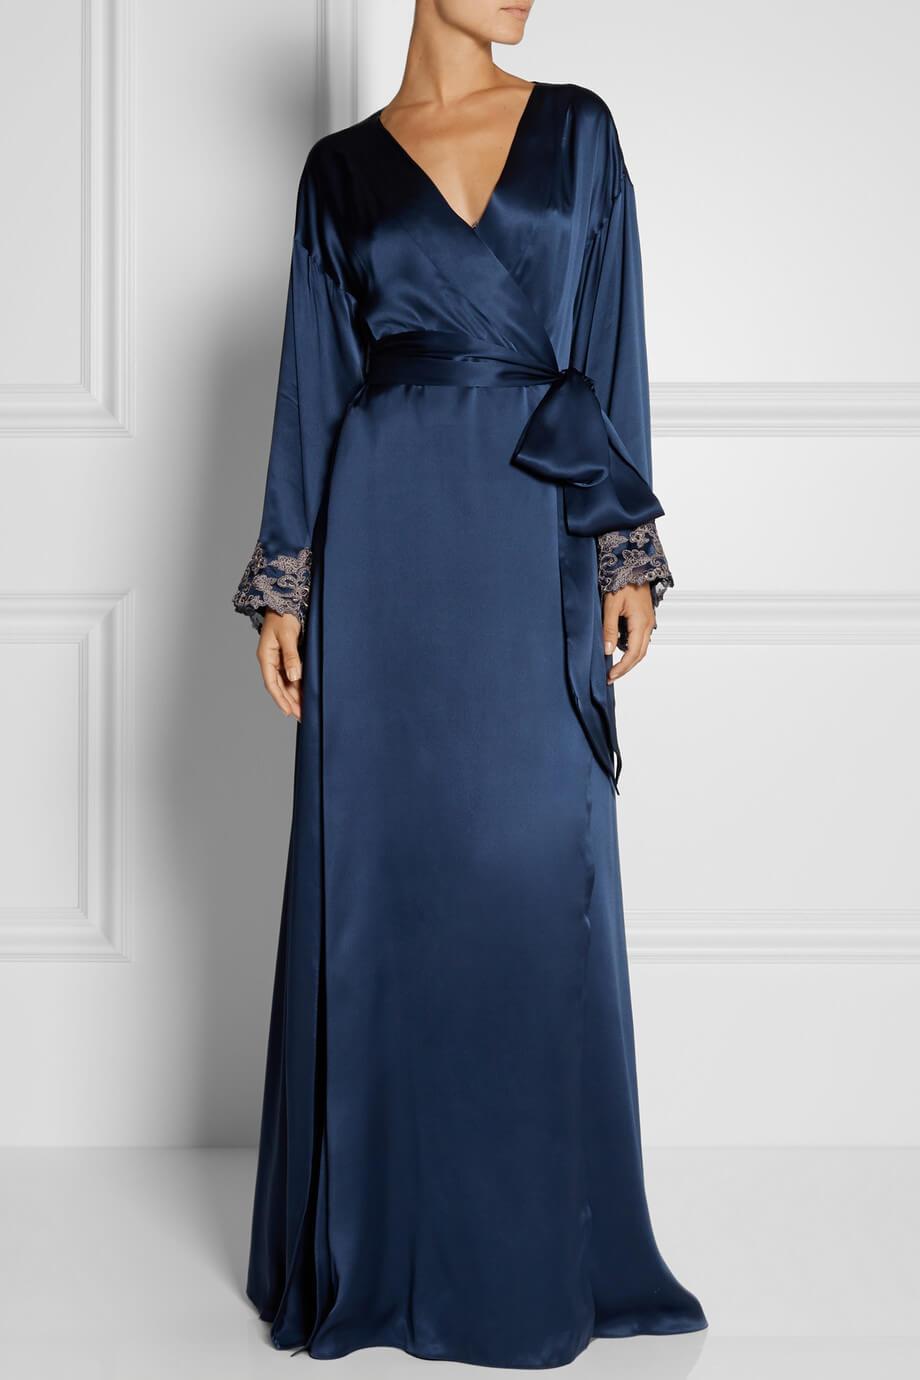 black silk robe - HD920×1380